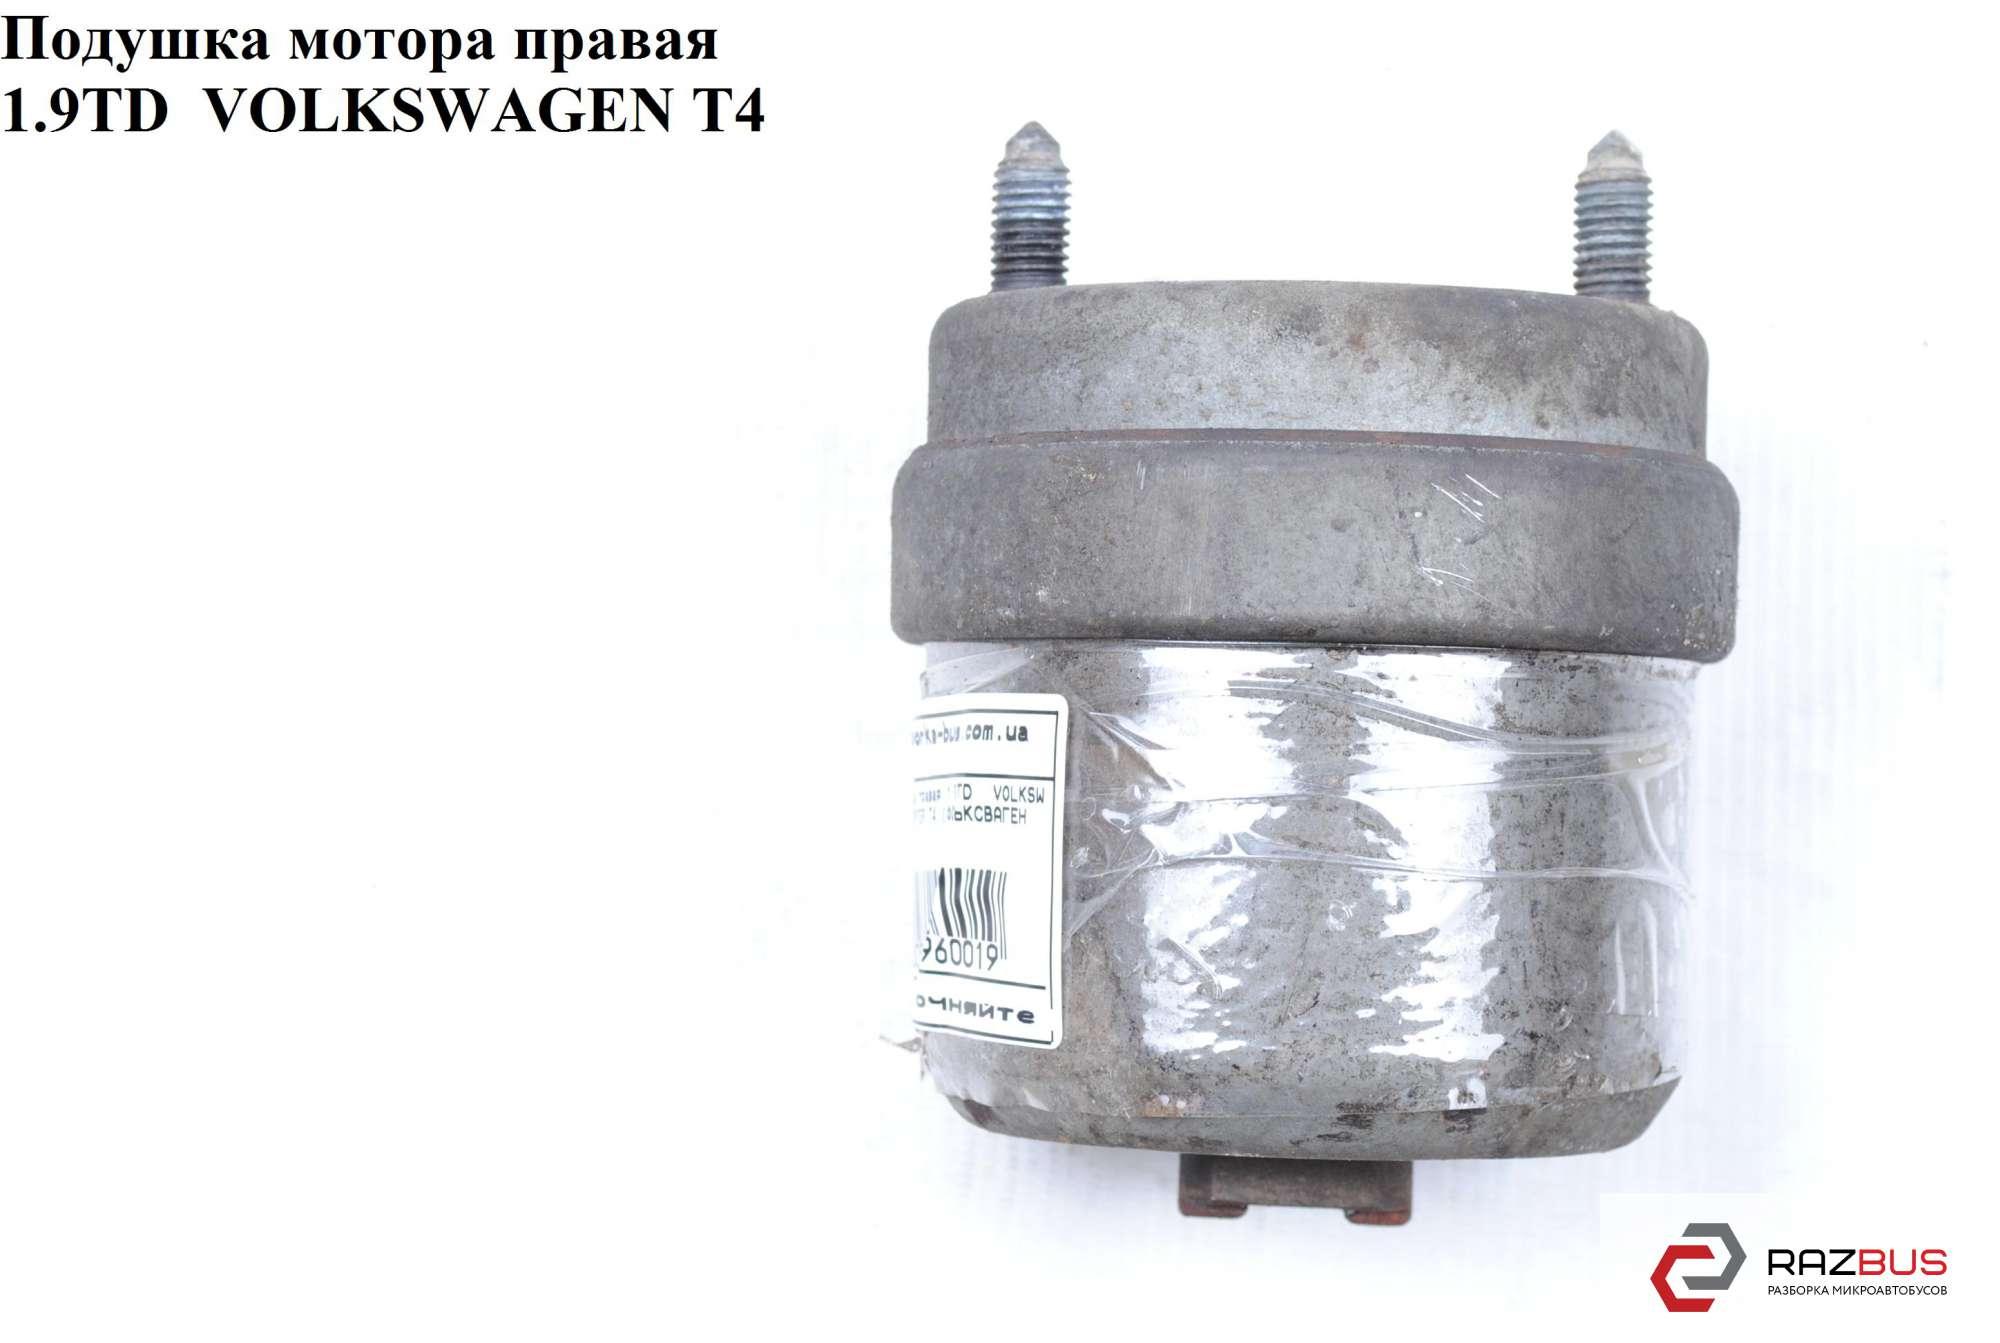 701199132C, 7D0199132C, 7D0199132E Подушка мотора правая 2.5TDI 1,9TD VOLKSWAGEN TRANSPORTER T4 1990-2003г